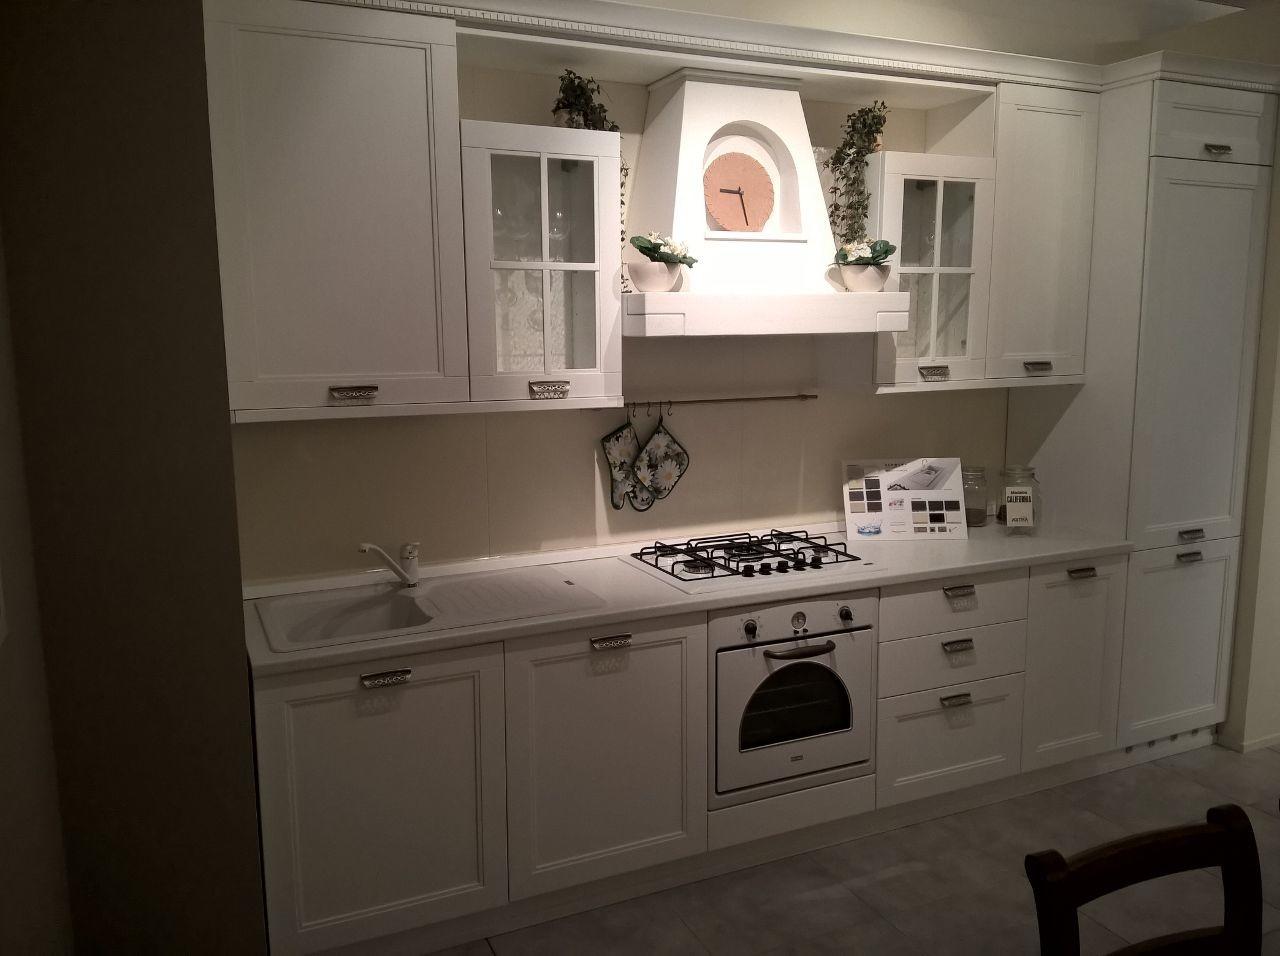 Stunning Cucine Astra Opinioni Gallery - Home Ideas - tyger.us